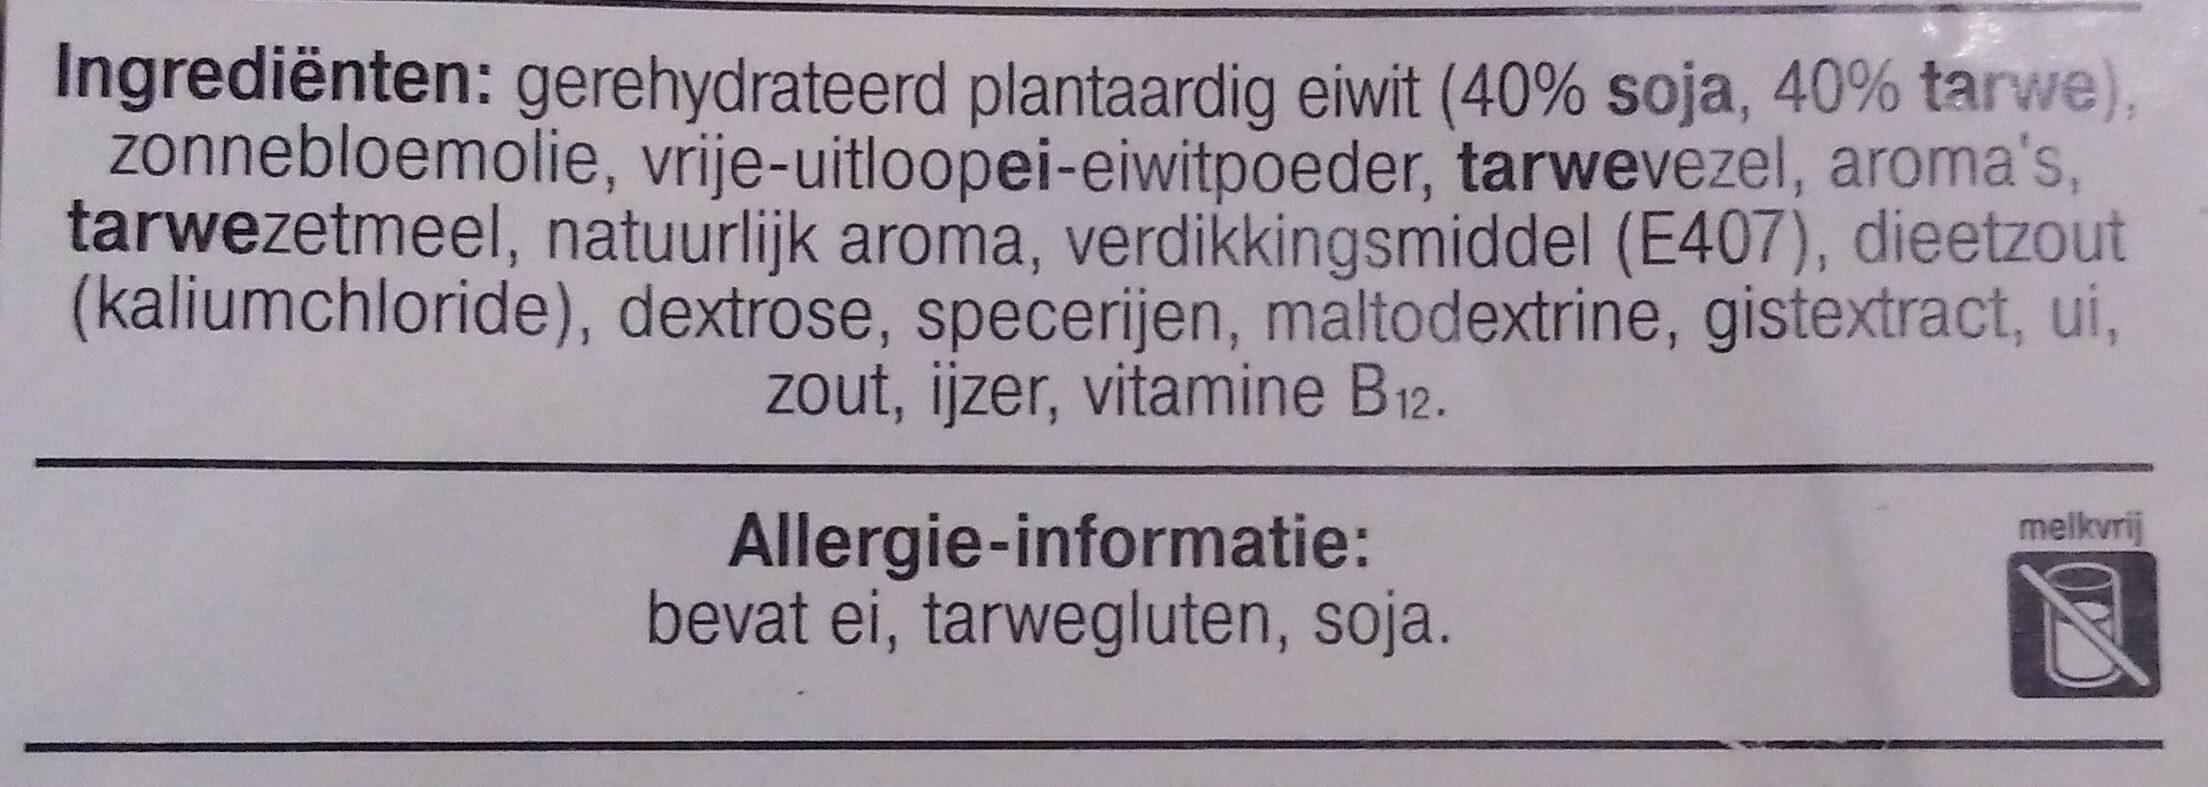 vegetarische basis wokstukjes - Ingrediënten